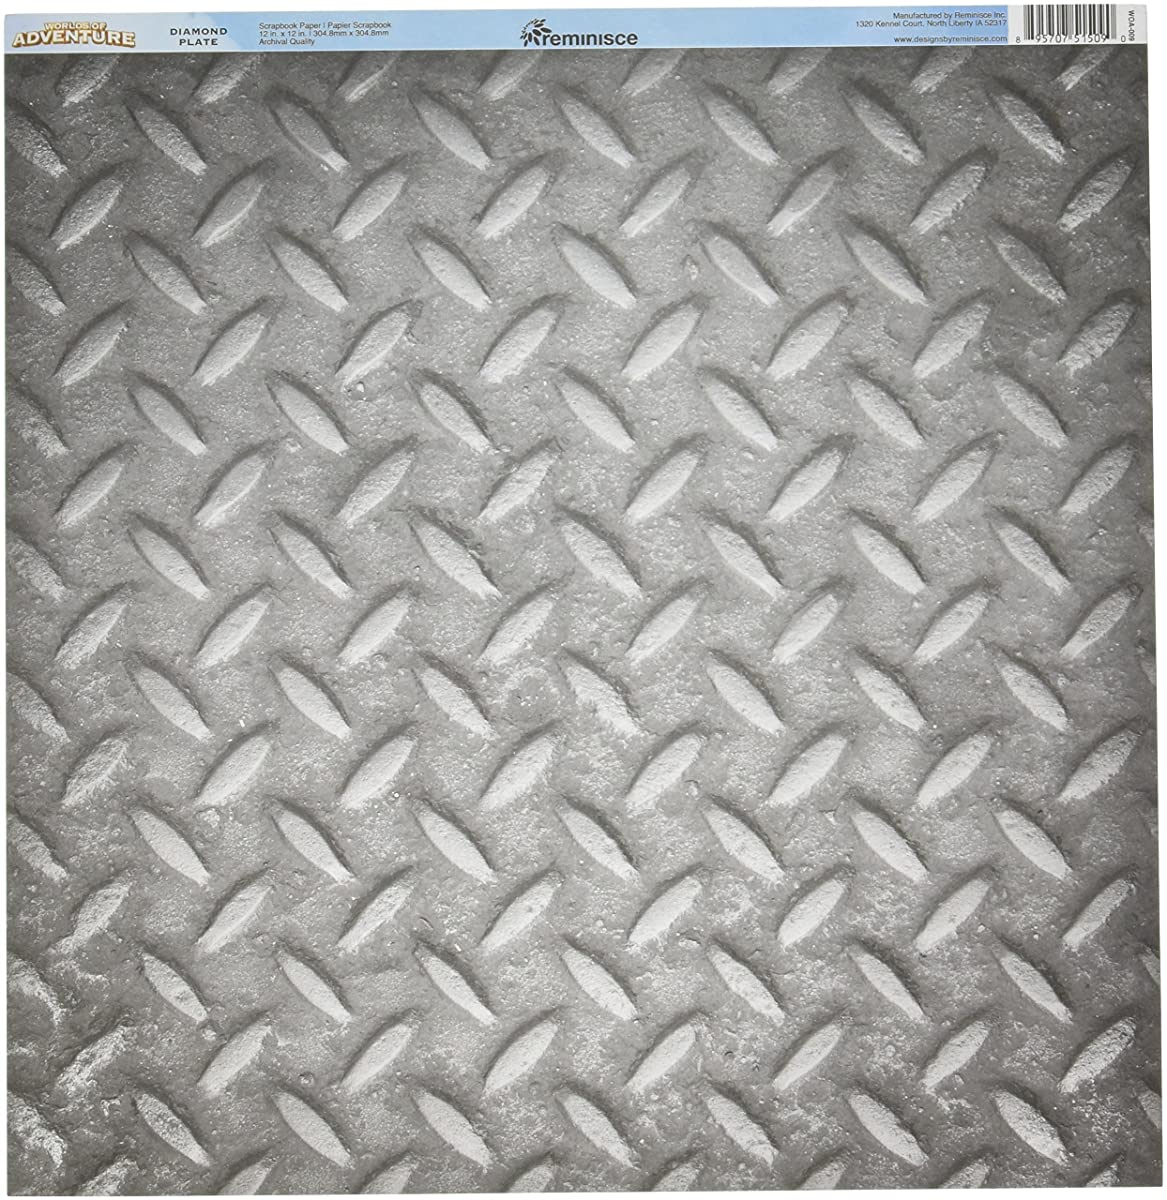 Reminisce WOA-009 25 Sheet Diamond Plate Worlds of Adventure Double-Sided Cardstock, 12